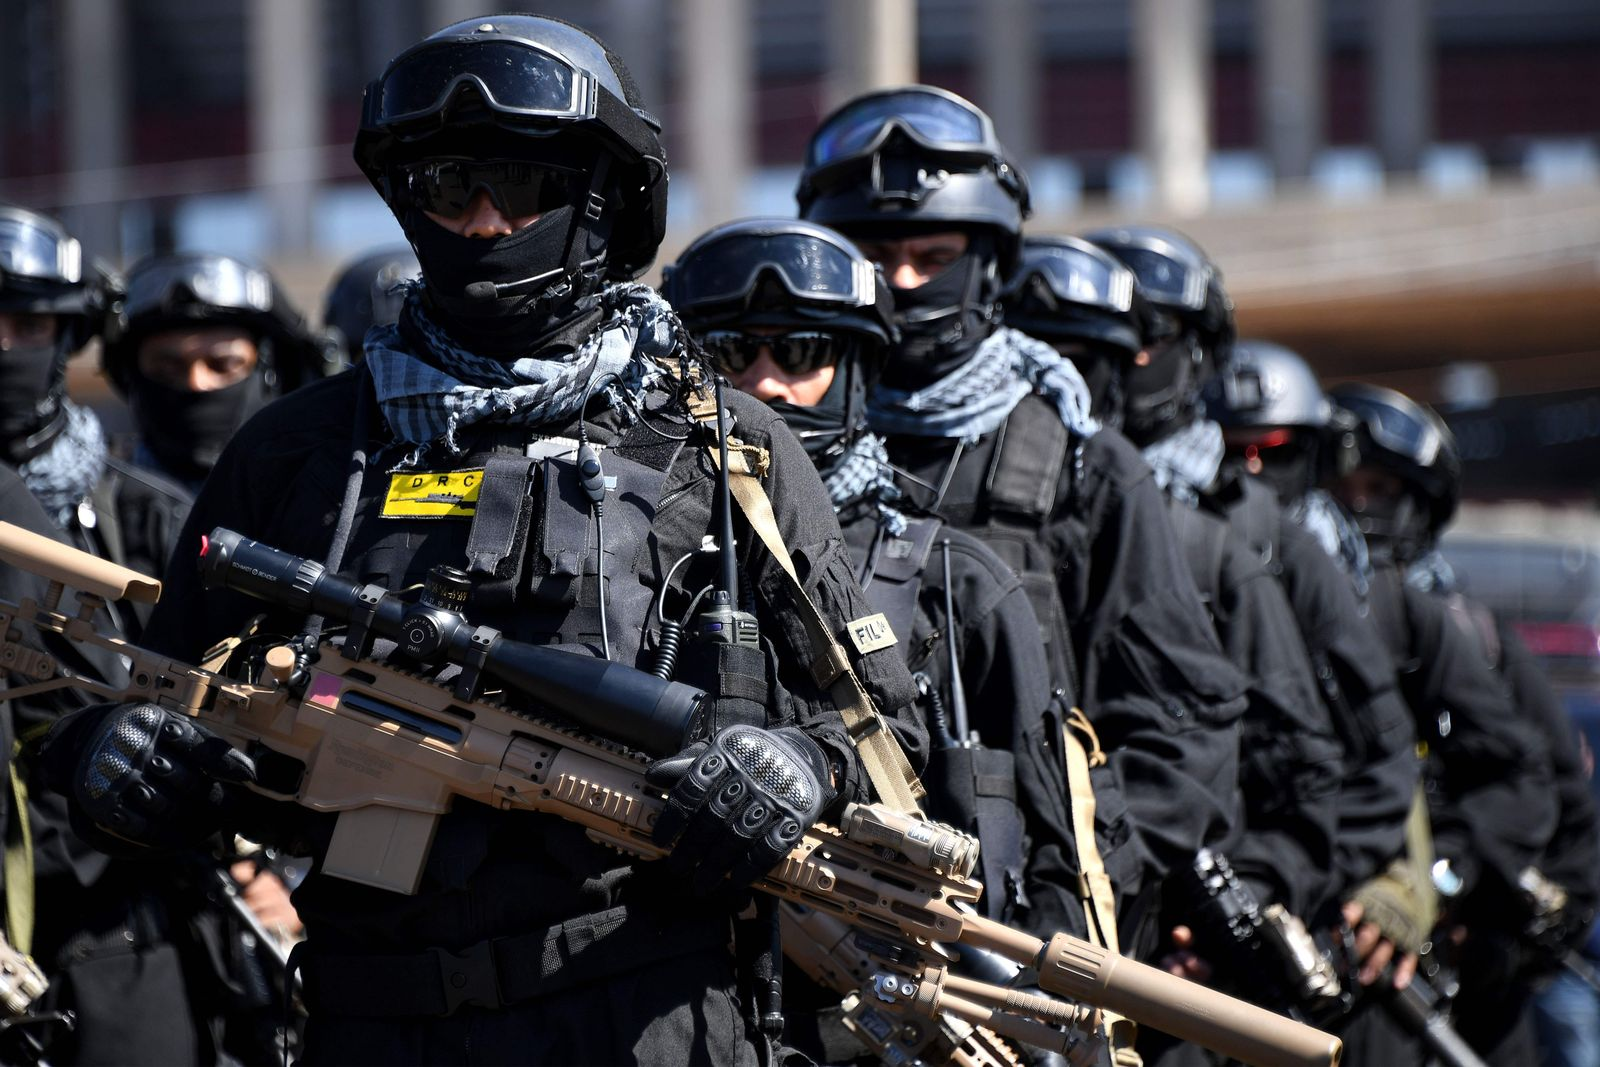 OLY-2016-RIO-SECURITY-BRASILIA